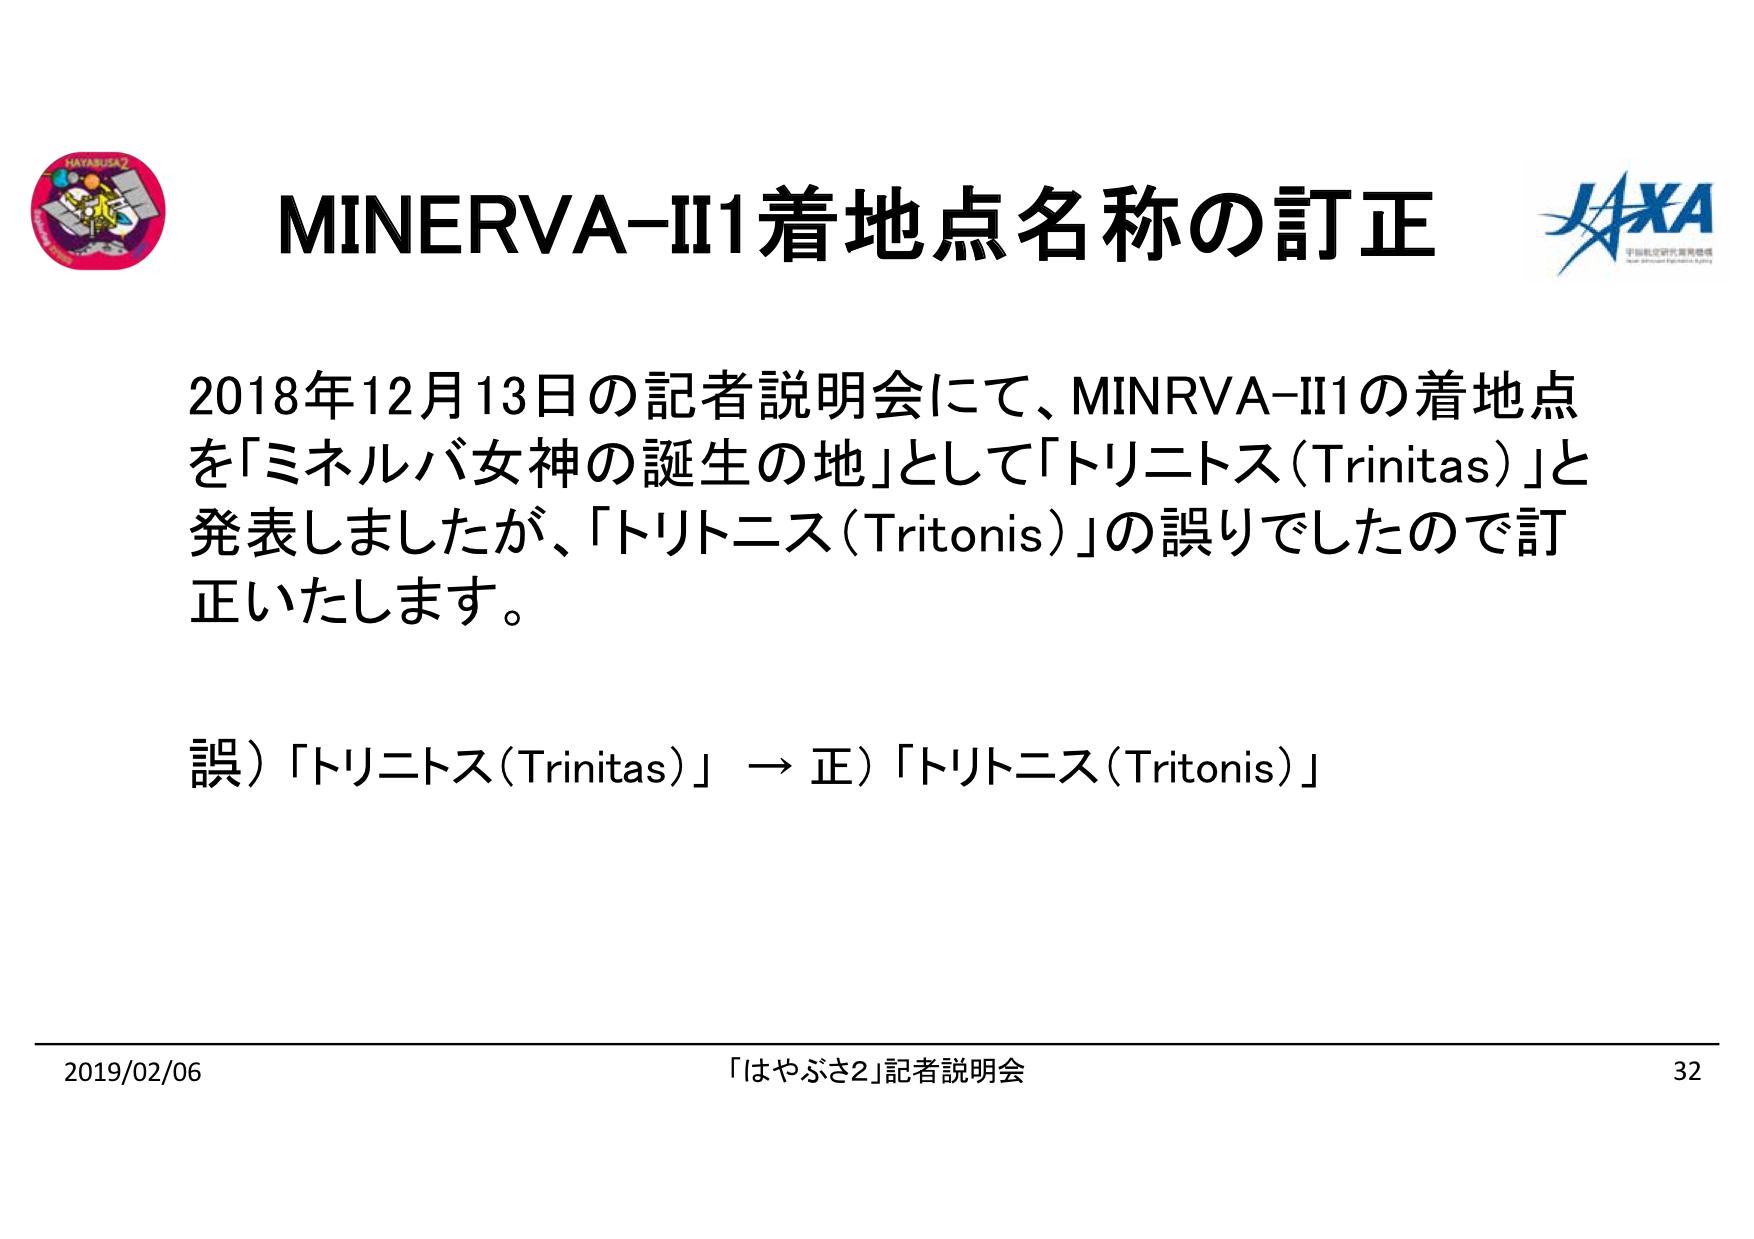 f:id:Imamura:20190204175526p:plain